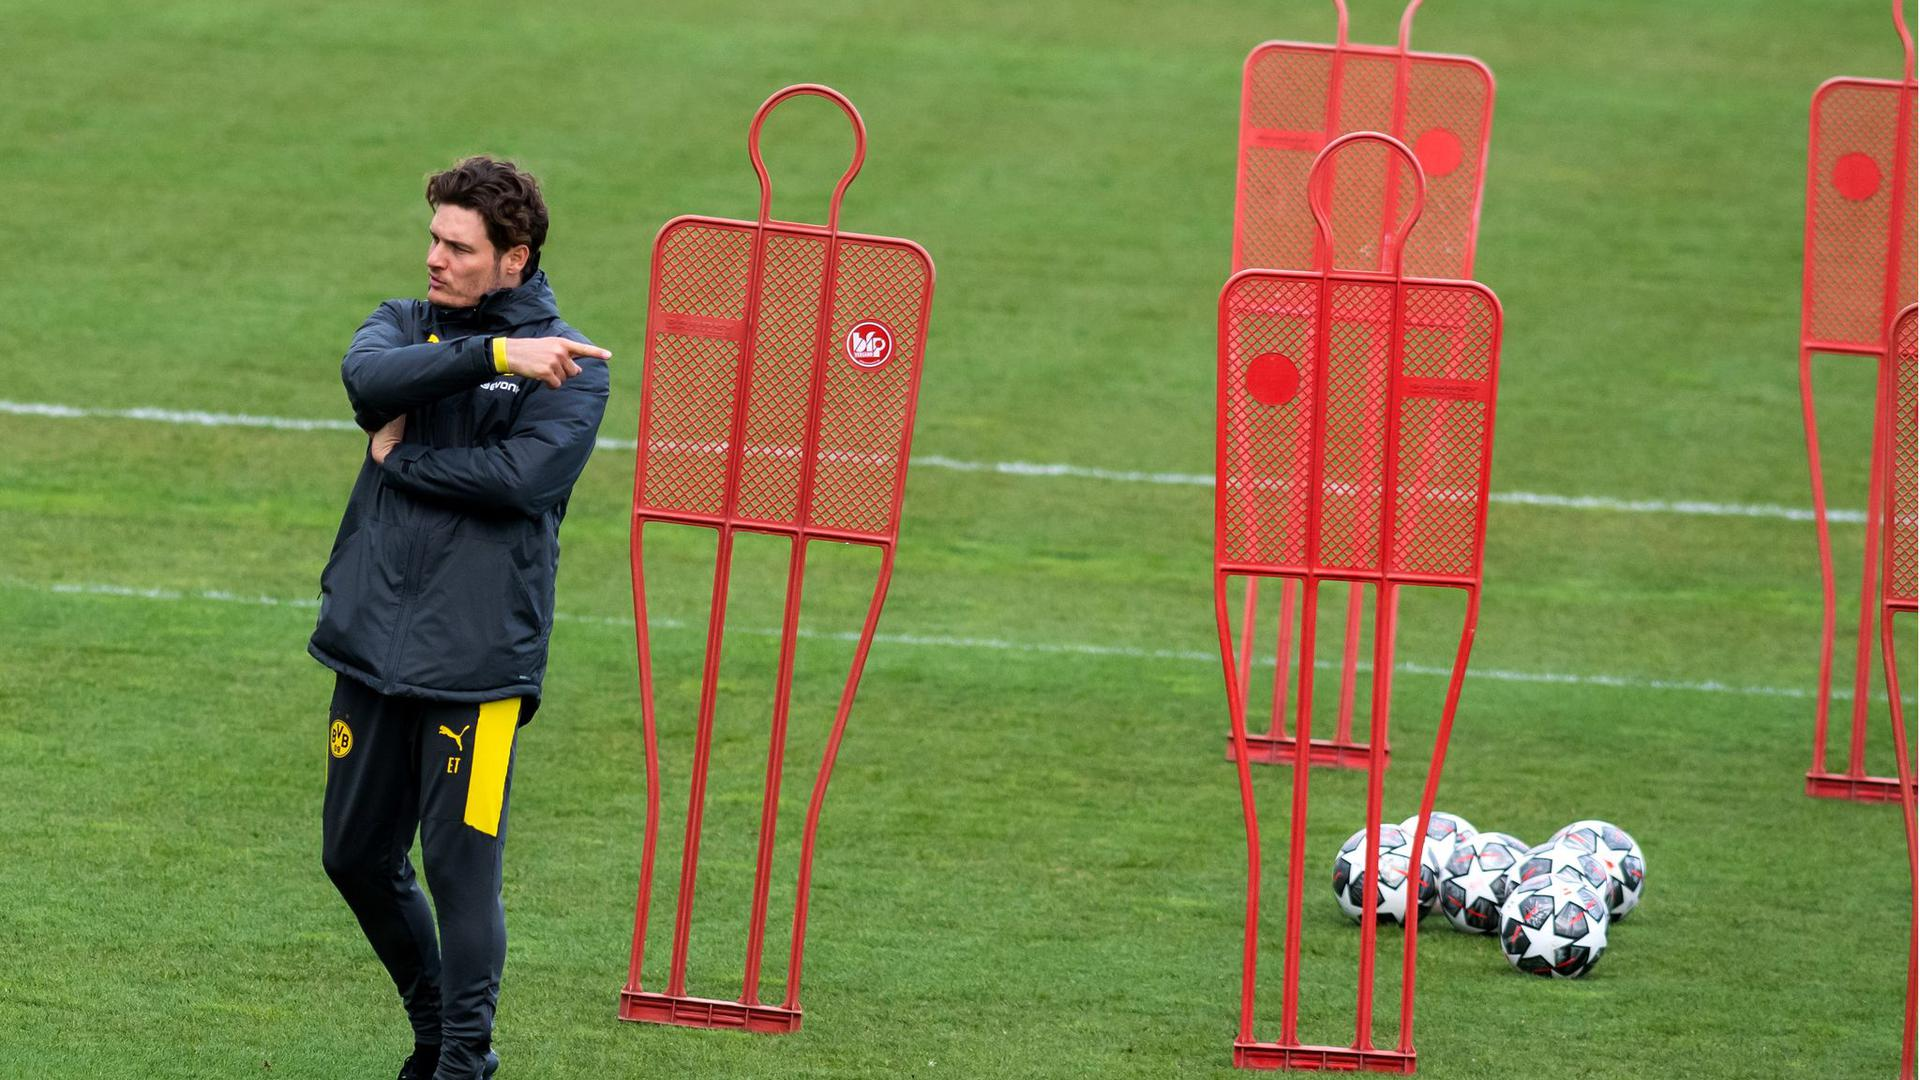 Kann gegen Manchester City auf Mats Hummels, Marco Reus und Jude Bellingham bauen: Trainer Edin Terzic.